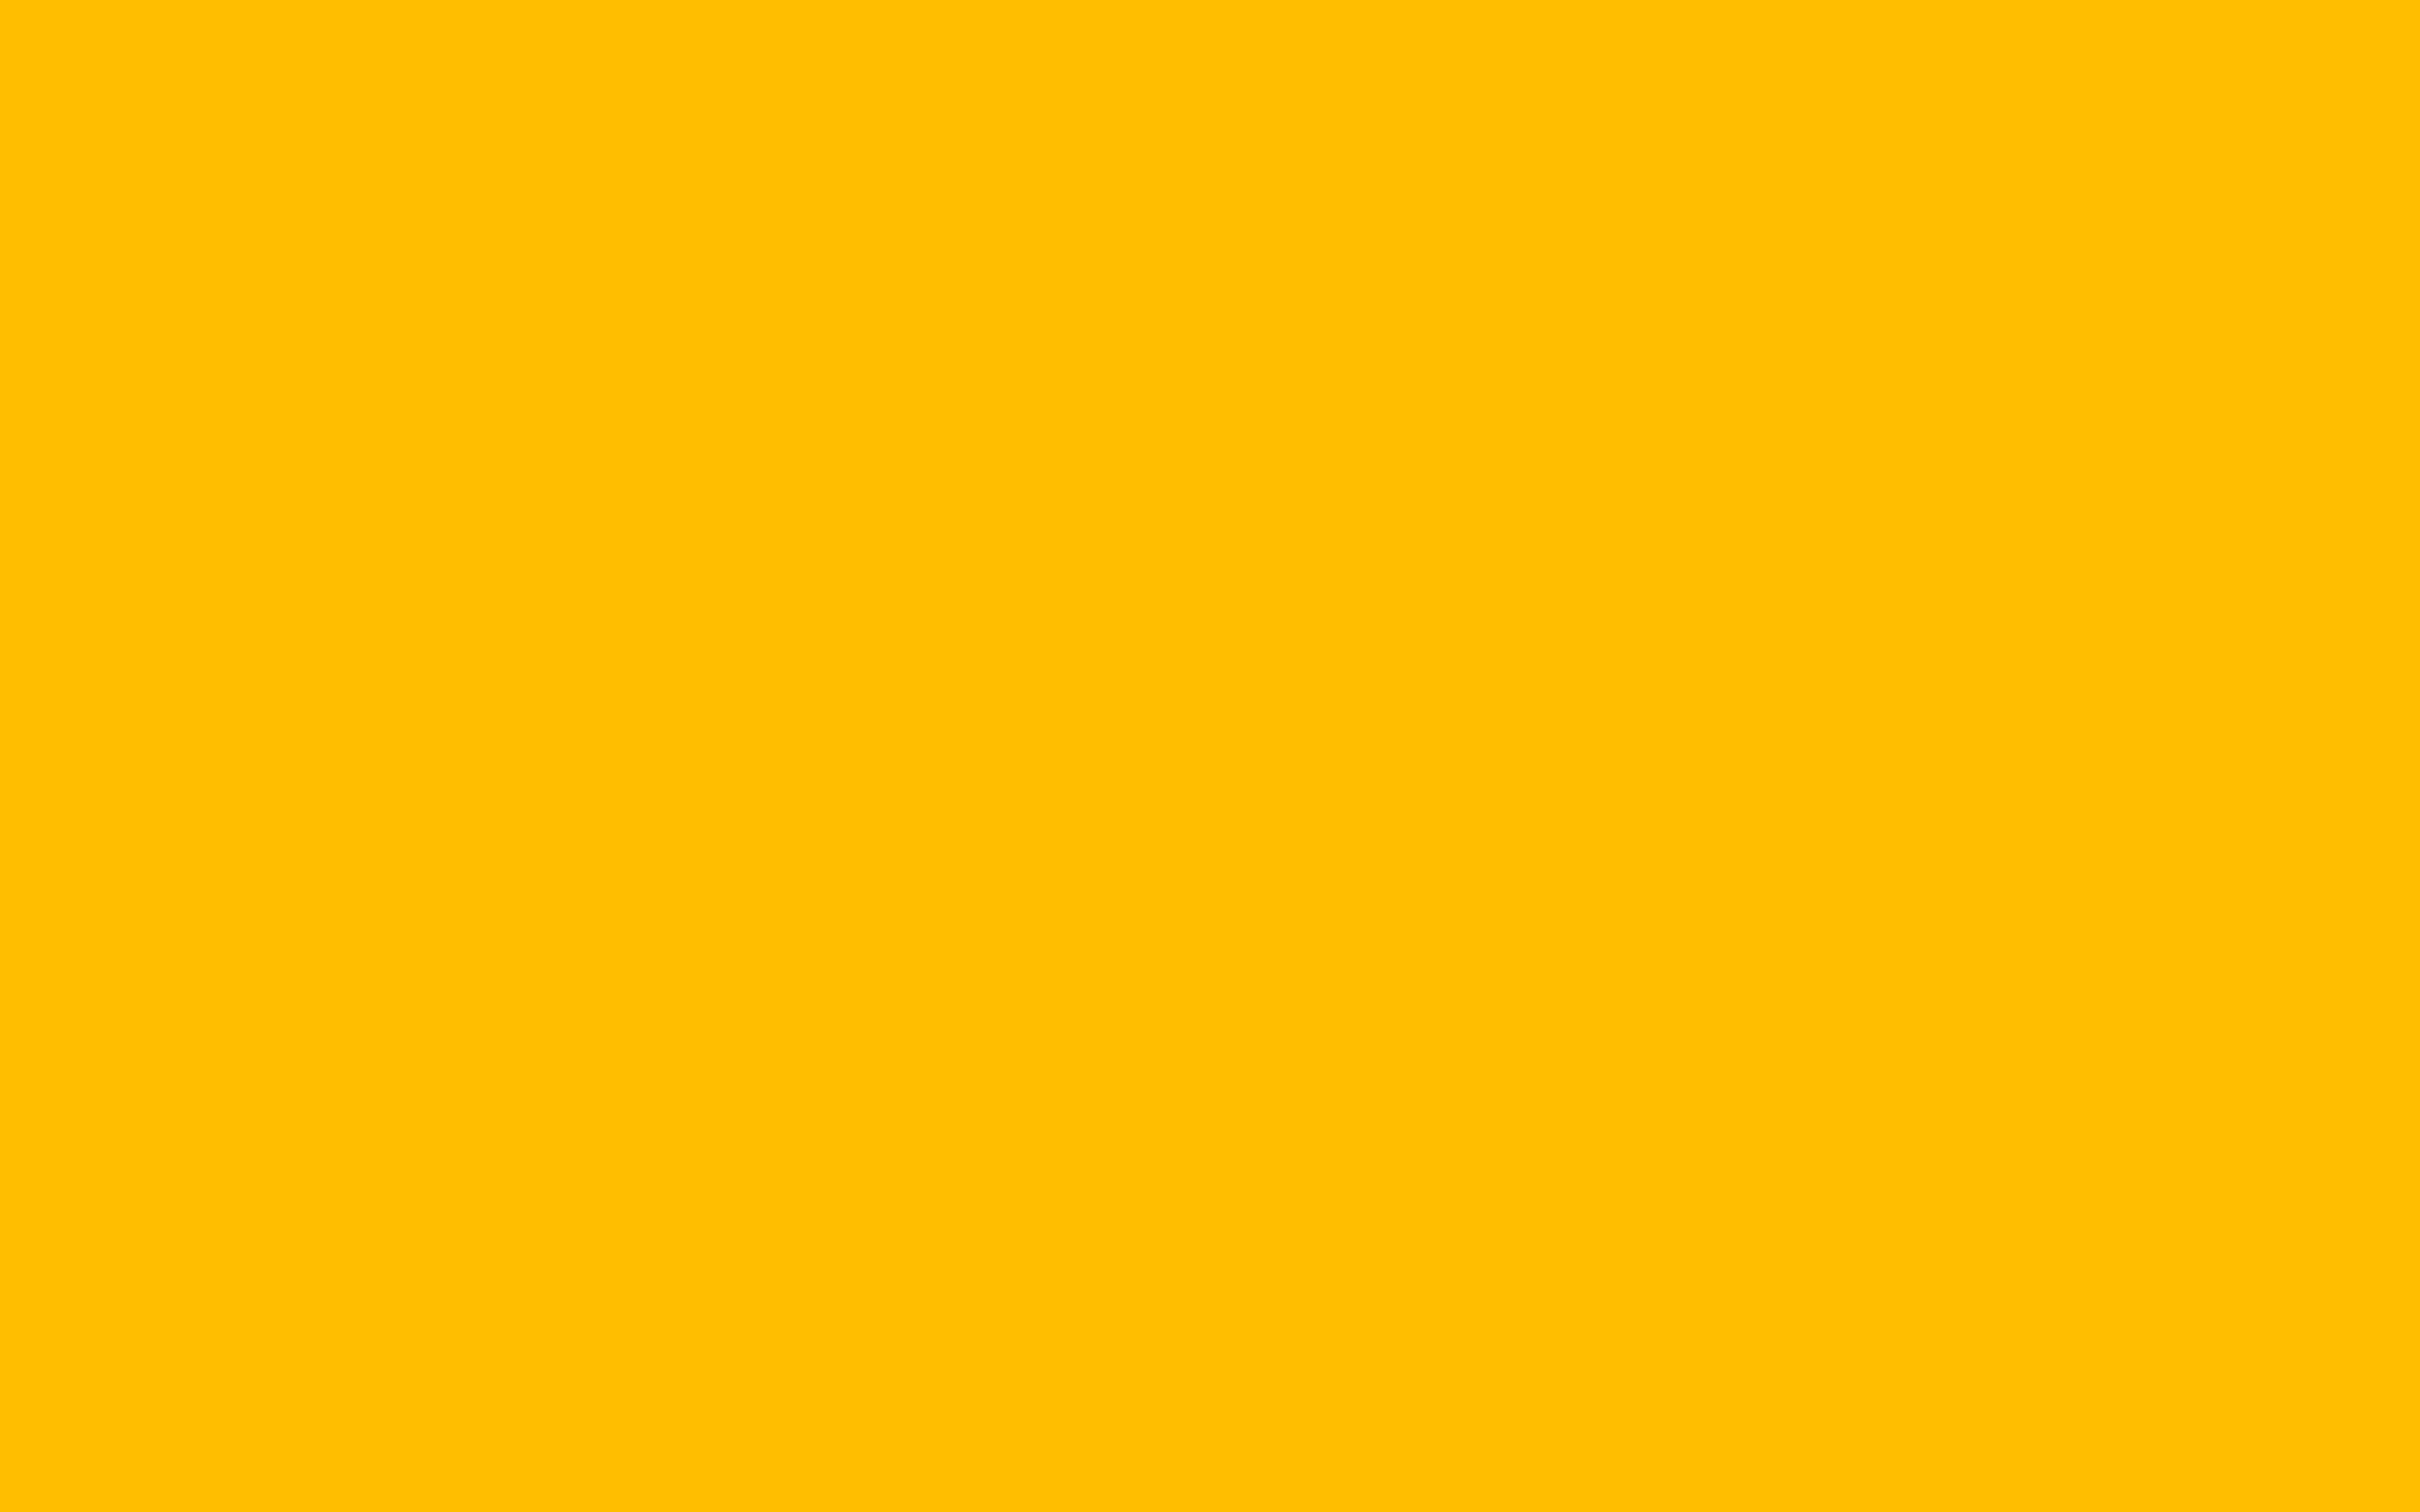 2560x1600 Fluorescent Orange Solid Color Background